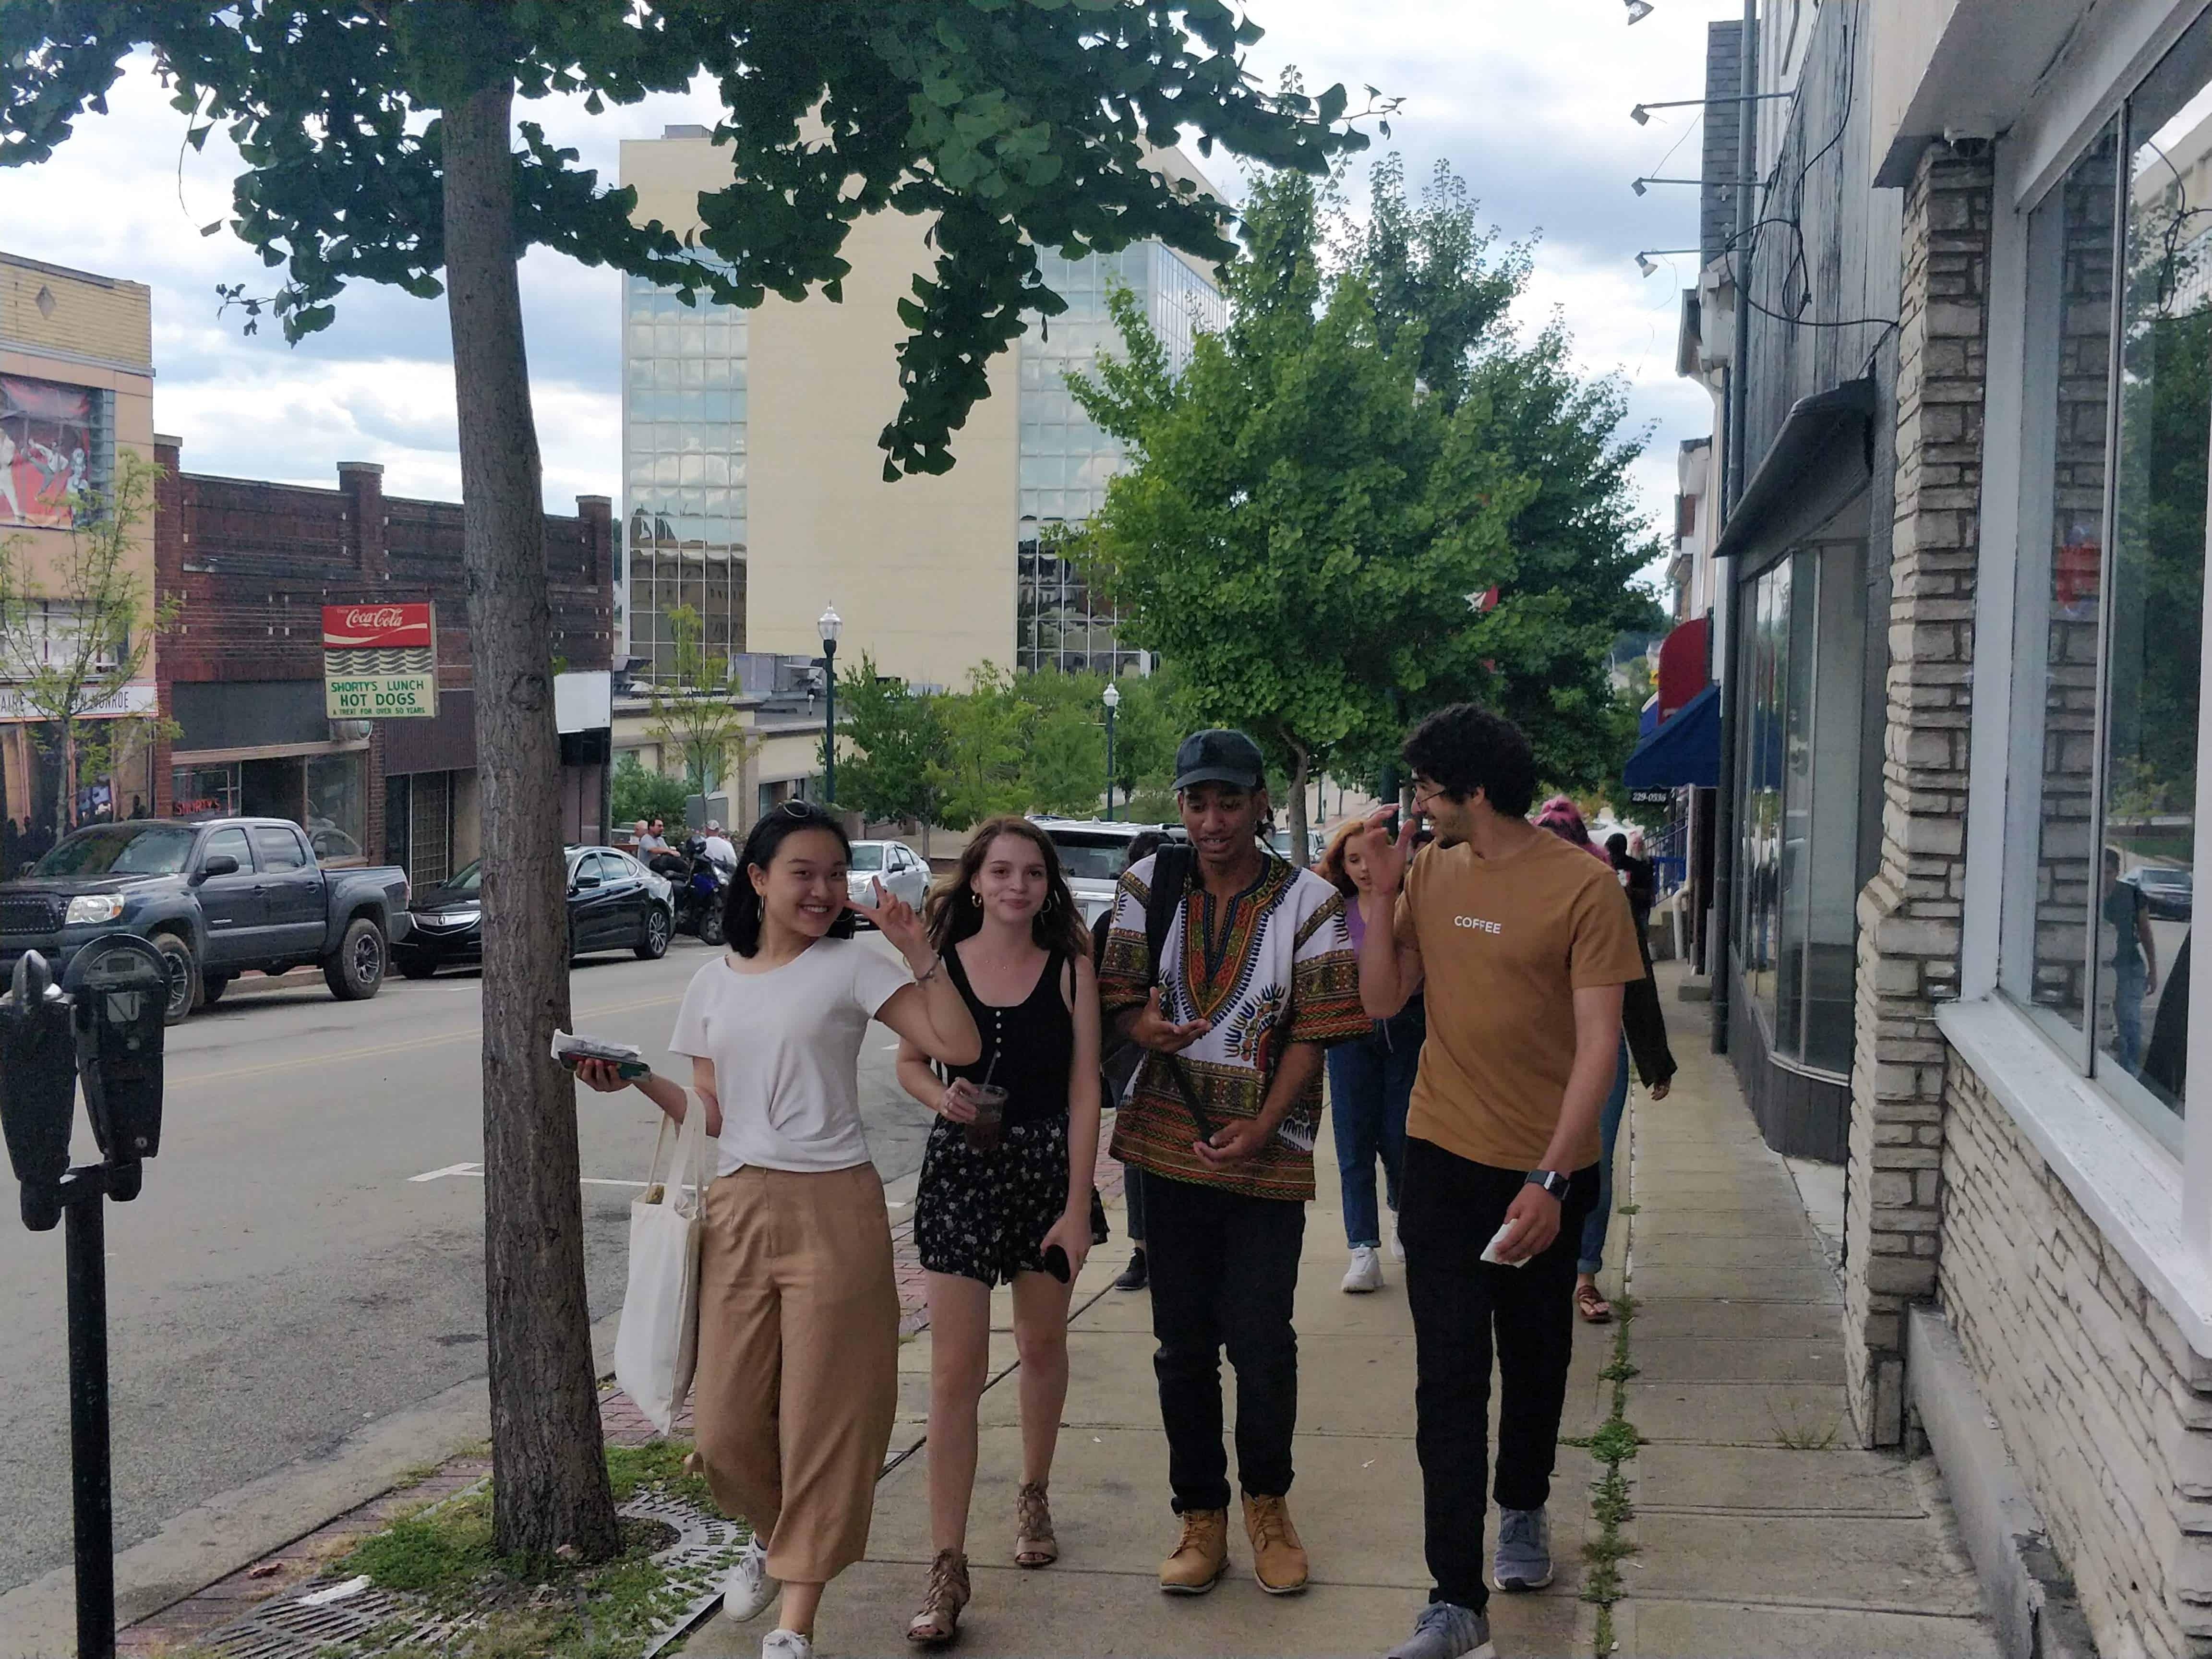 International Students walking through Washington, Pennsylvania.